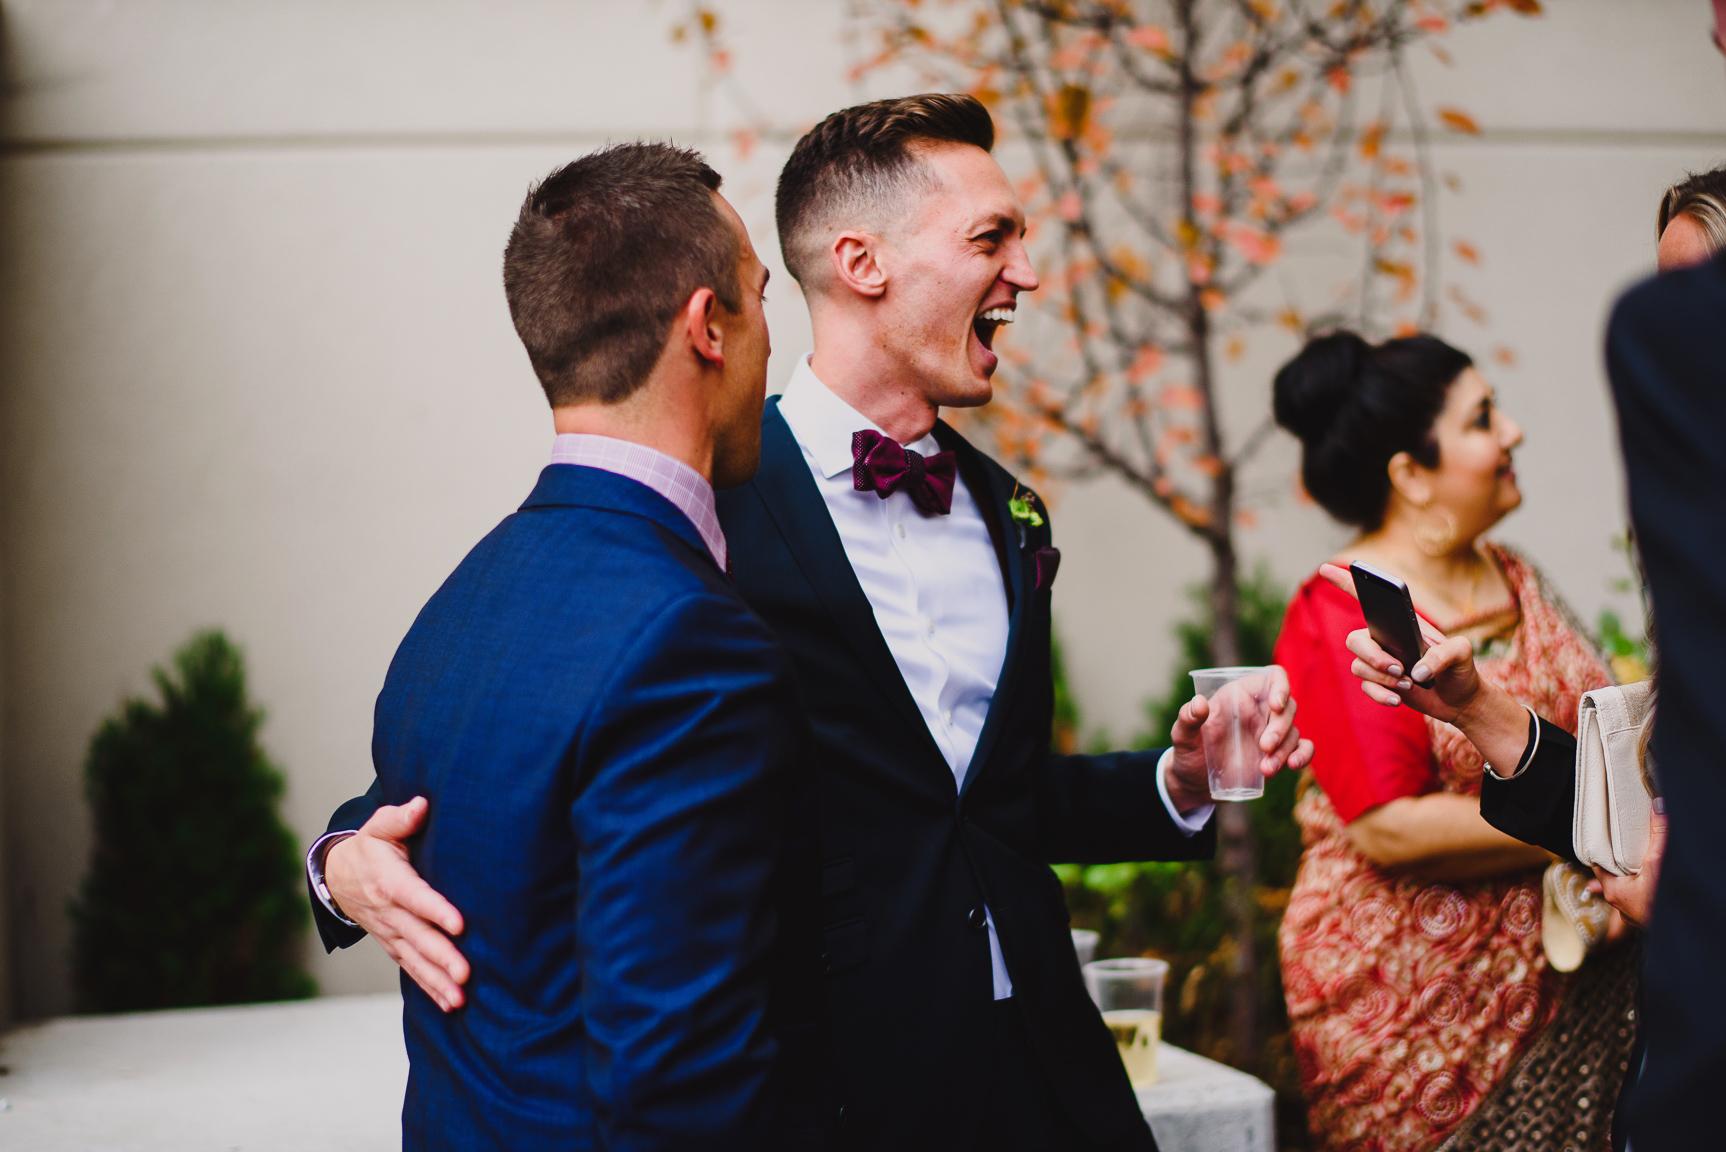 same-sex-wedding-photographer-61.jpg